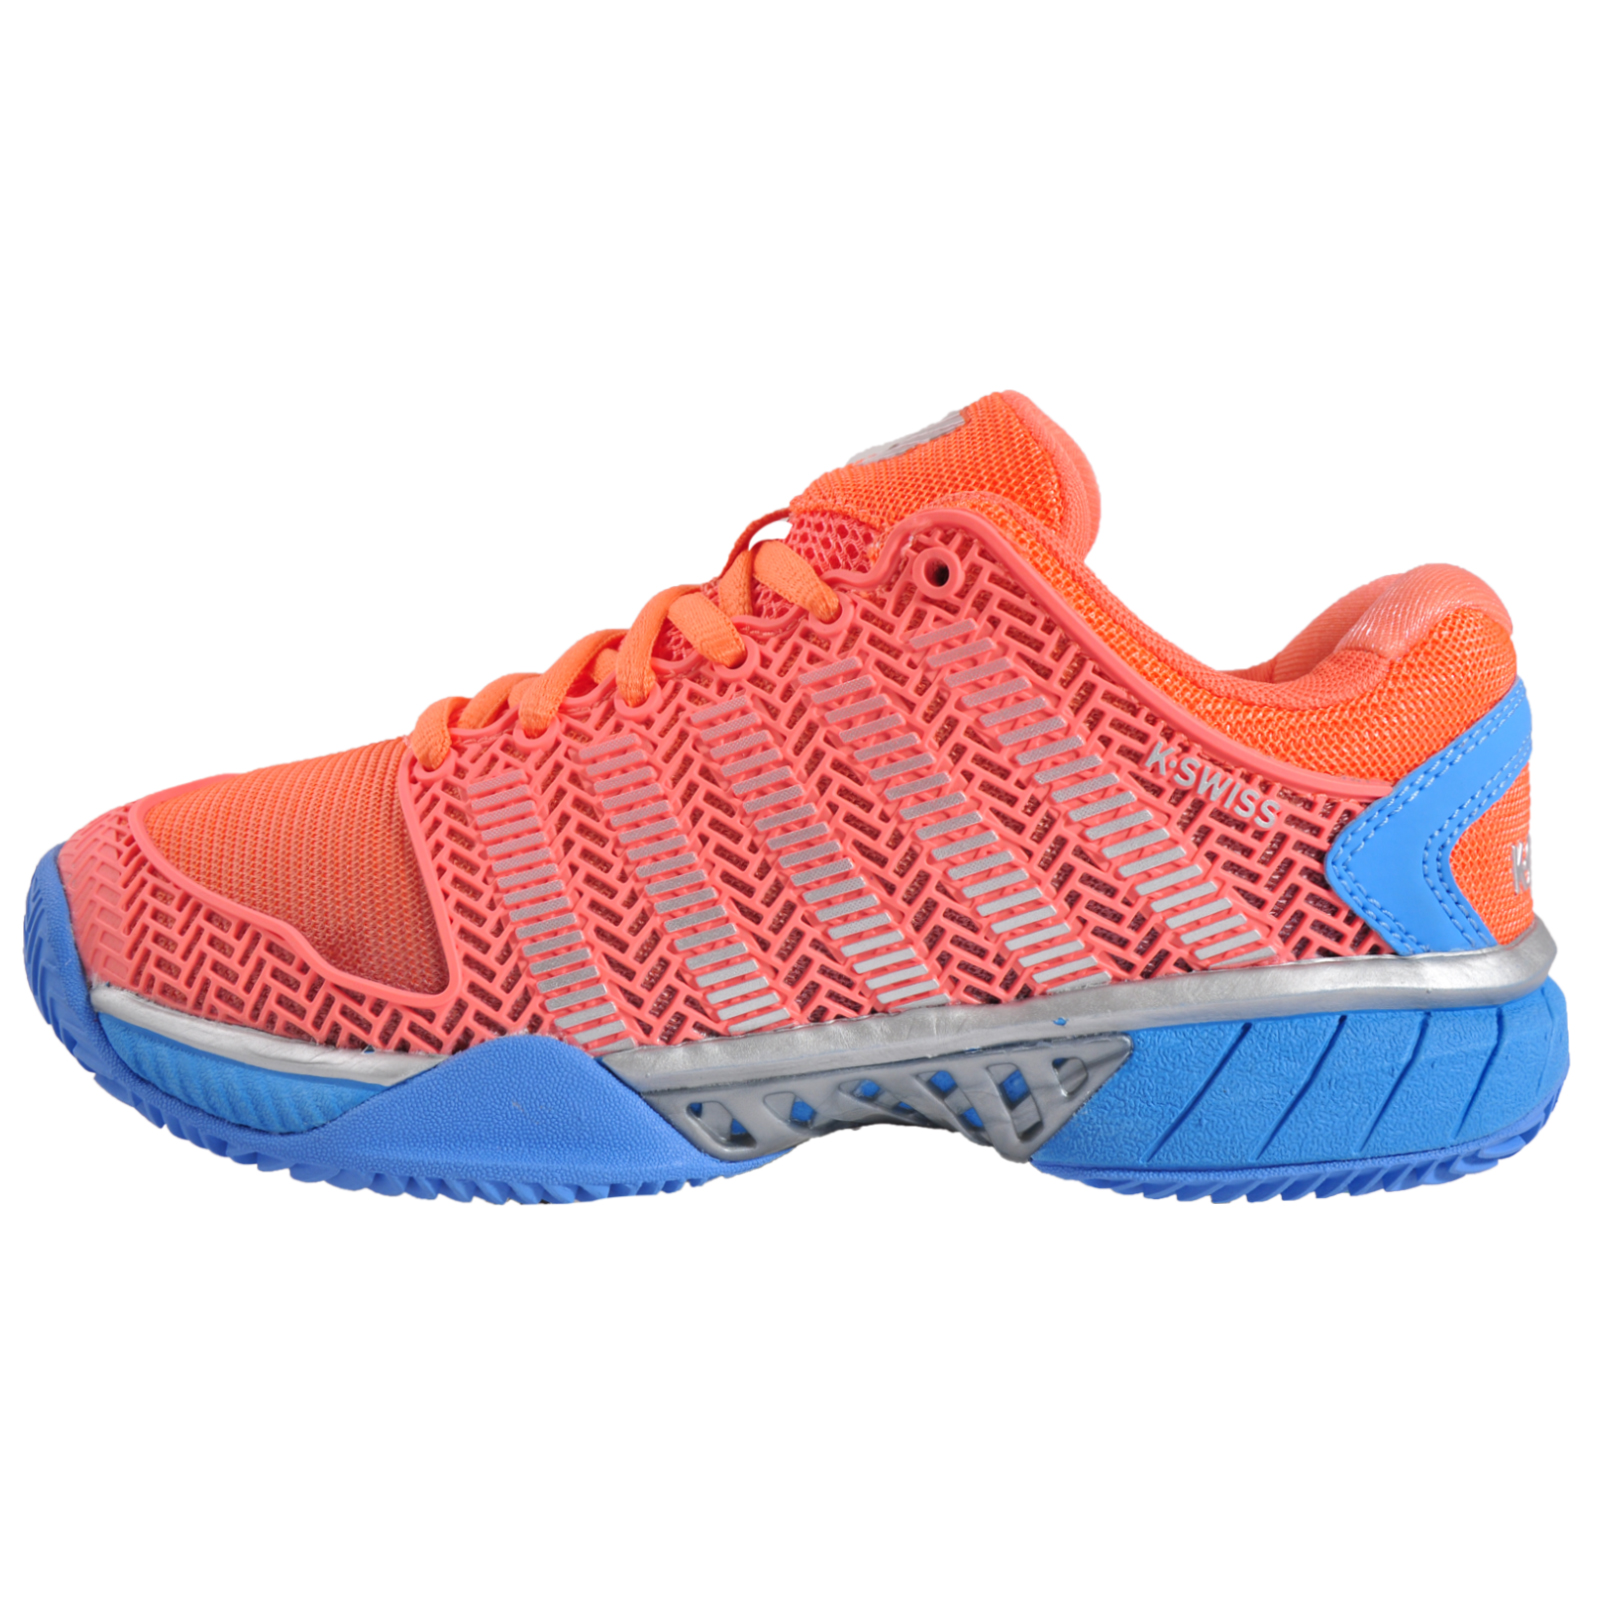 K Swiss Men's Tennis Shoes Tennis Warehouse Europe